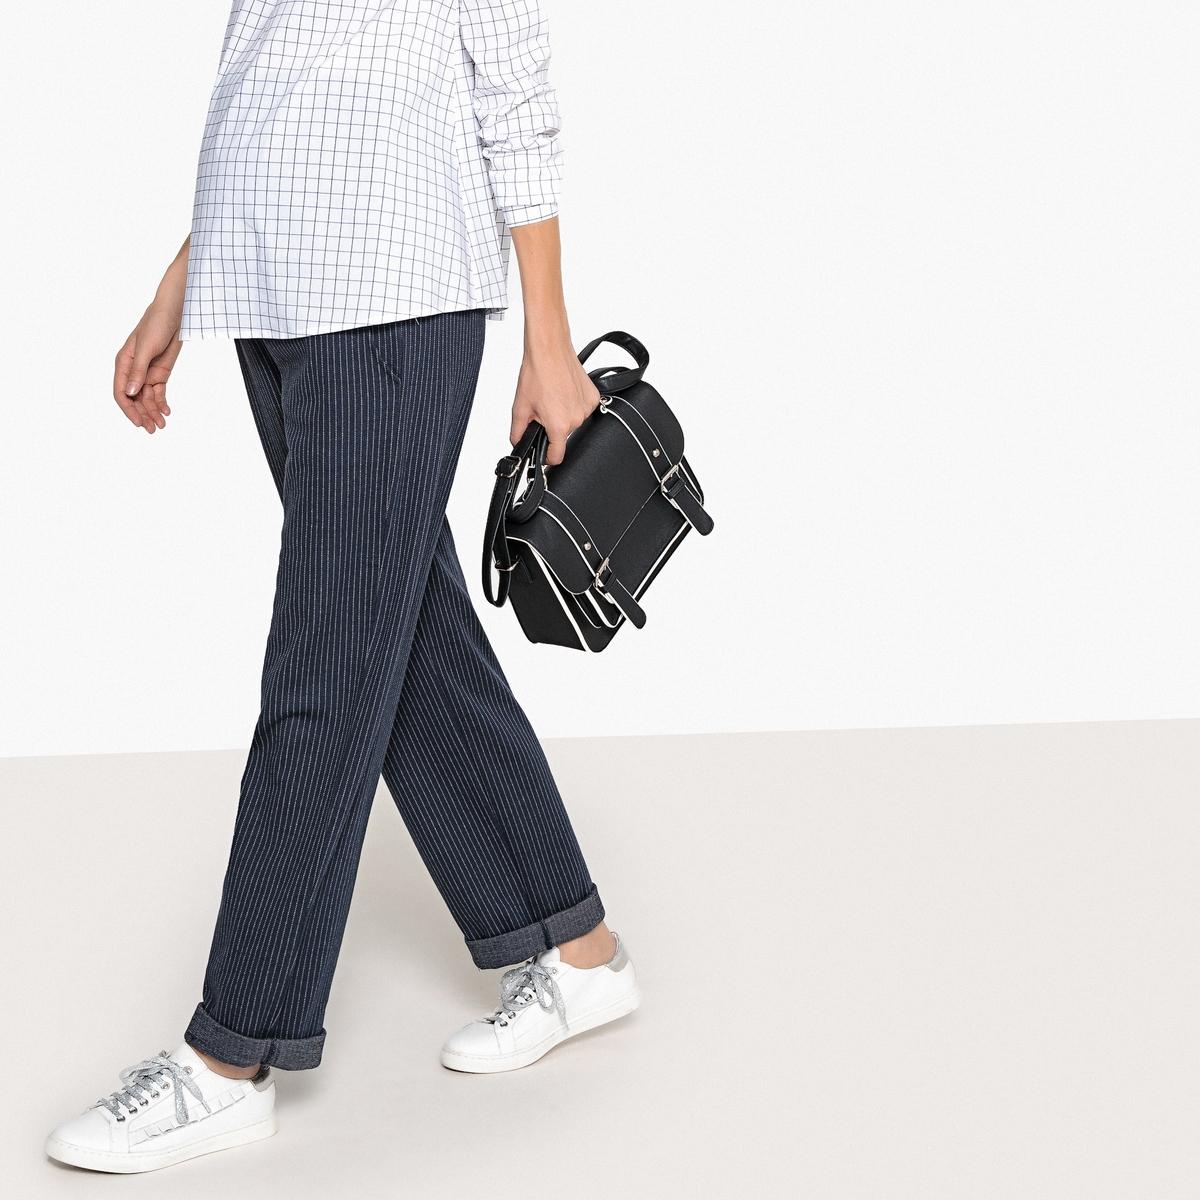 Pantaloni jogpants pre-maman, a righe